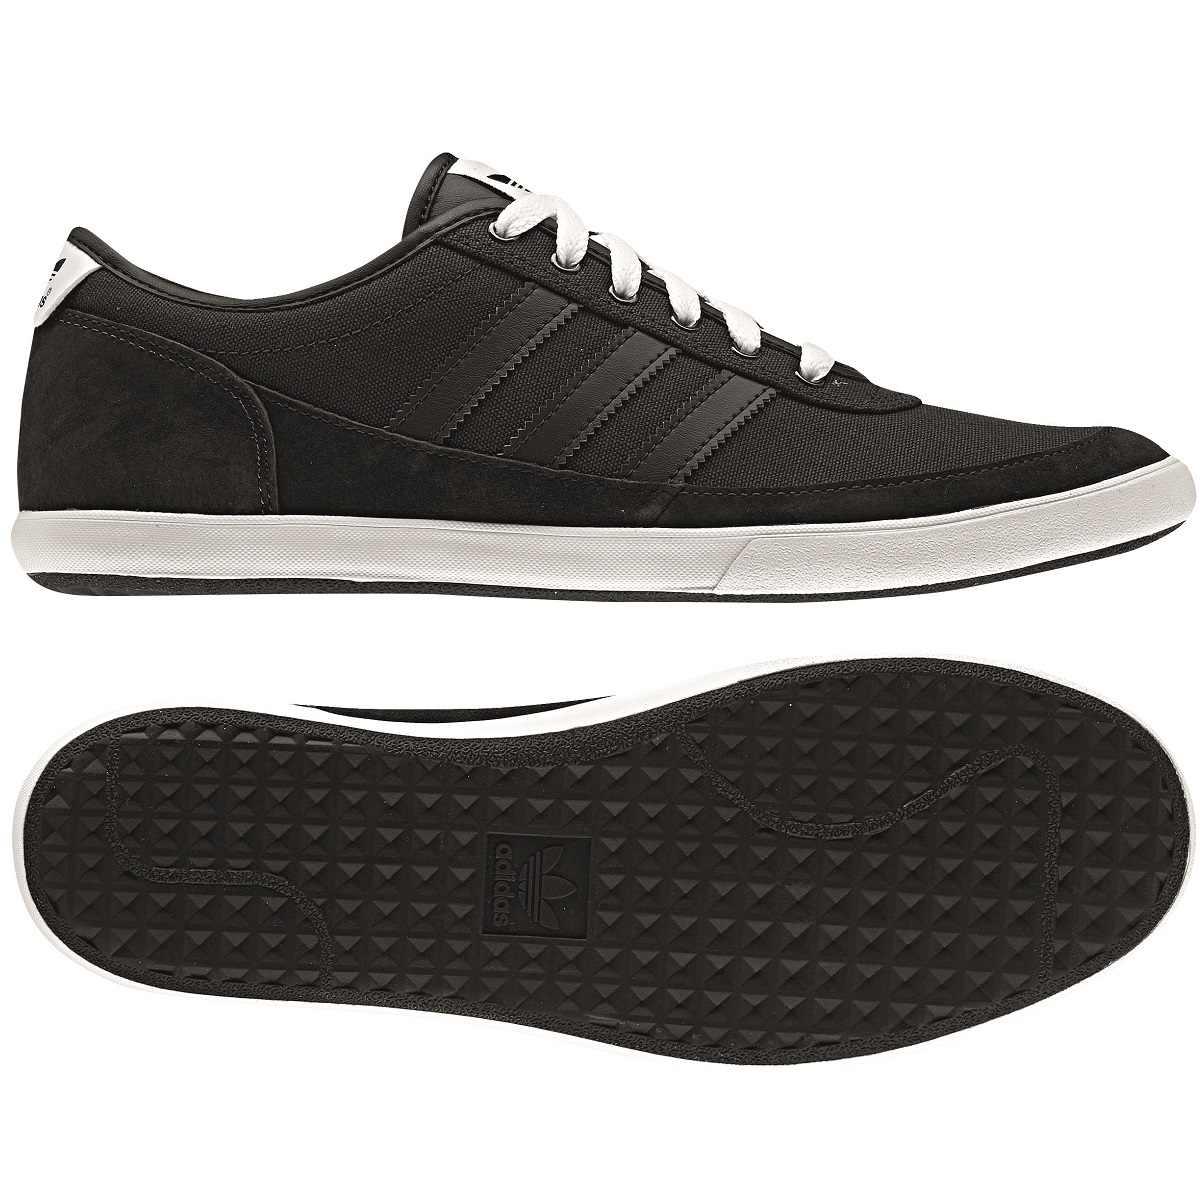 adidas court spin schuhe turnschuhe sneaker herren schwarz grau ebay. Black Bedroom Furniture Sets. Home Design Ideas